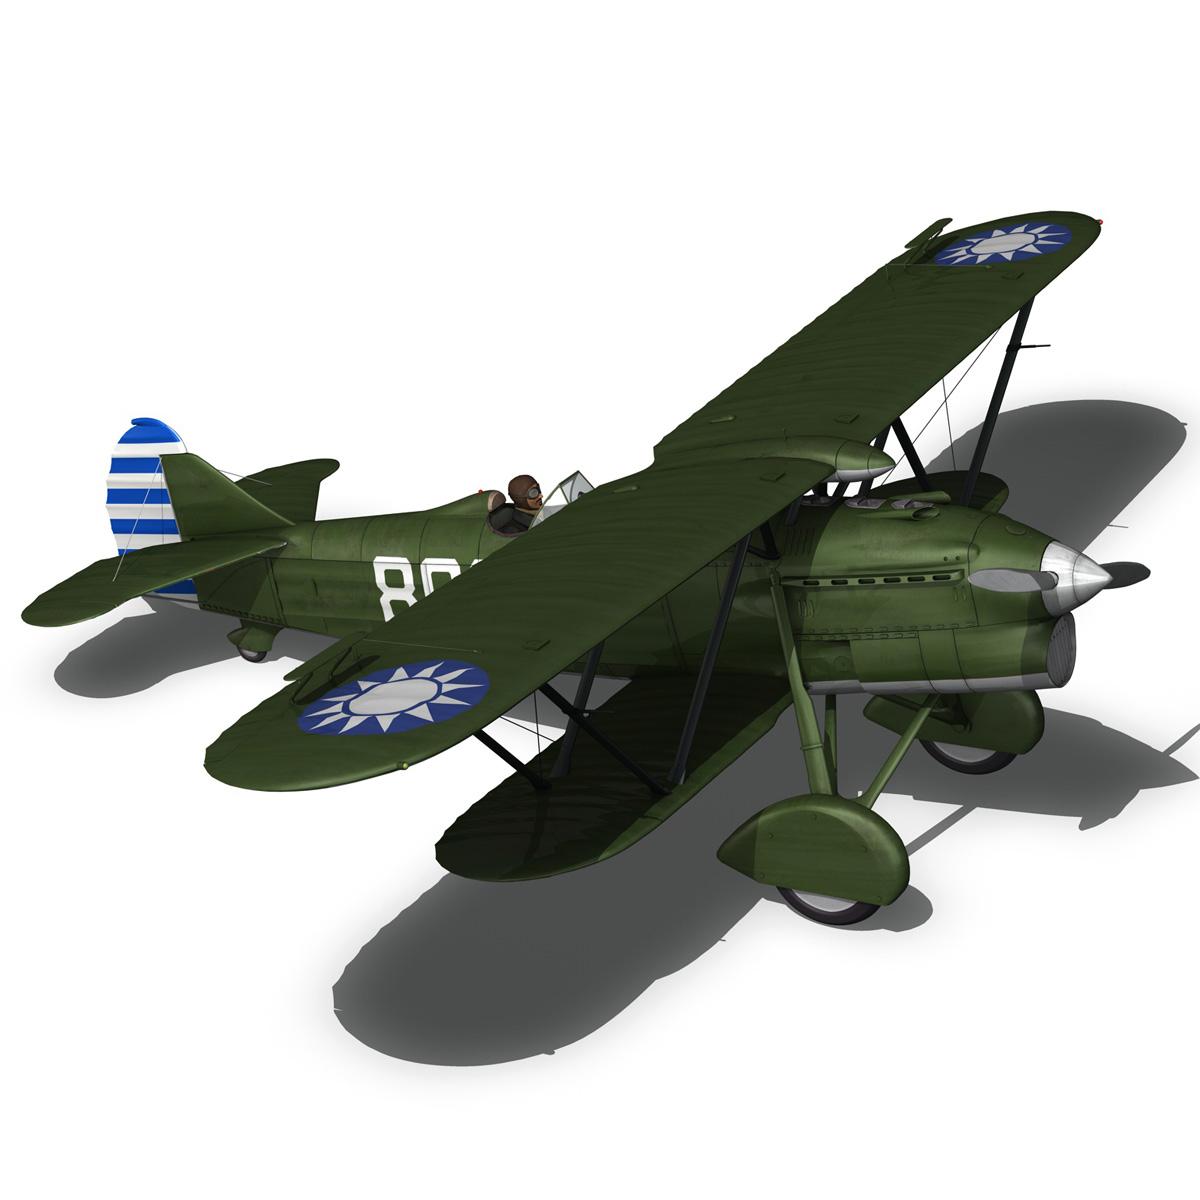 fiat cr.32 – chinese nationalist air force 3d model fbx c4d lwo obj 272640